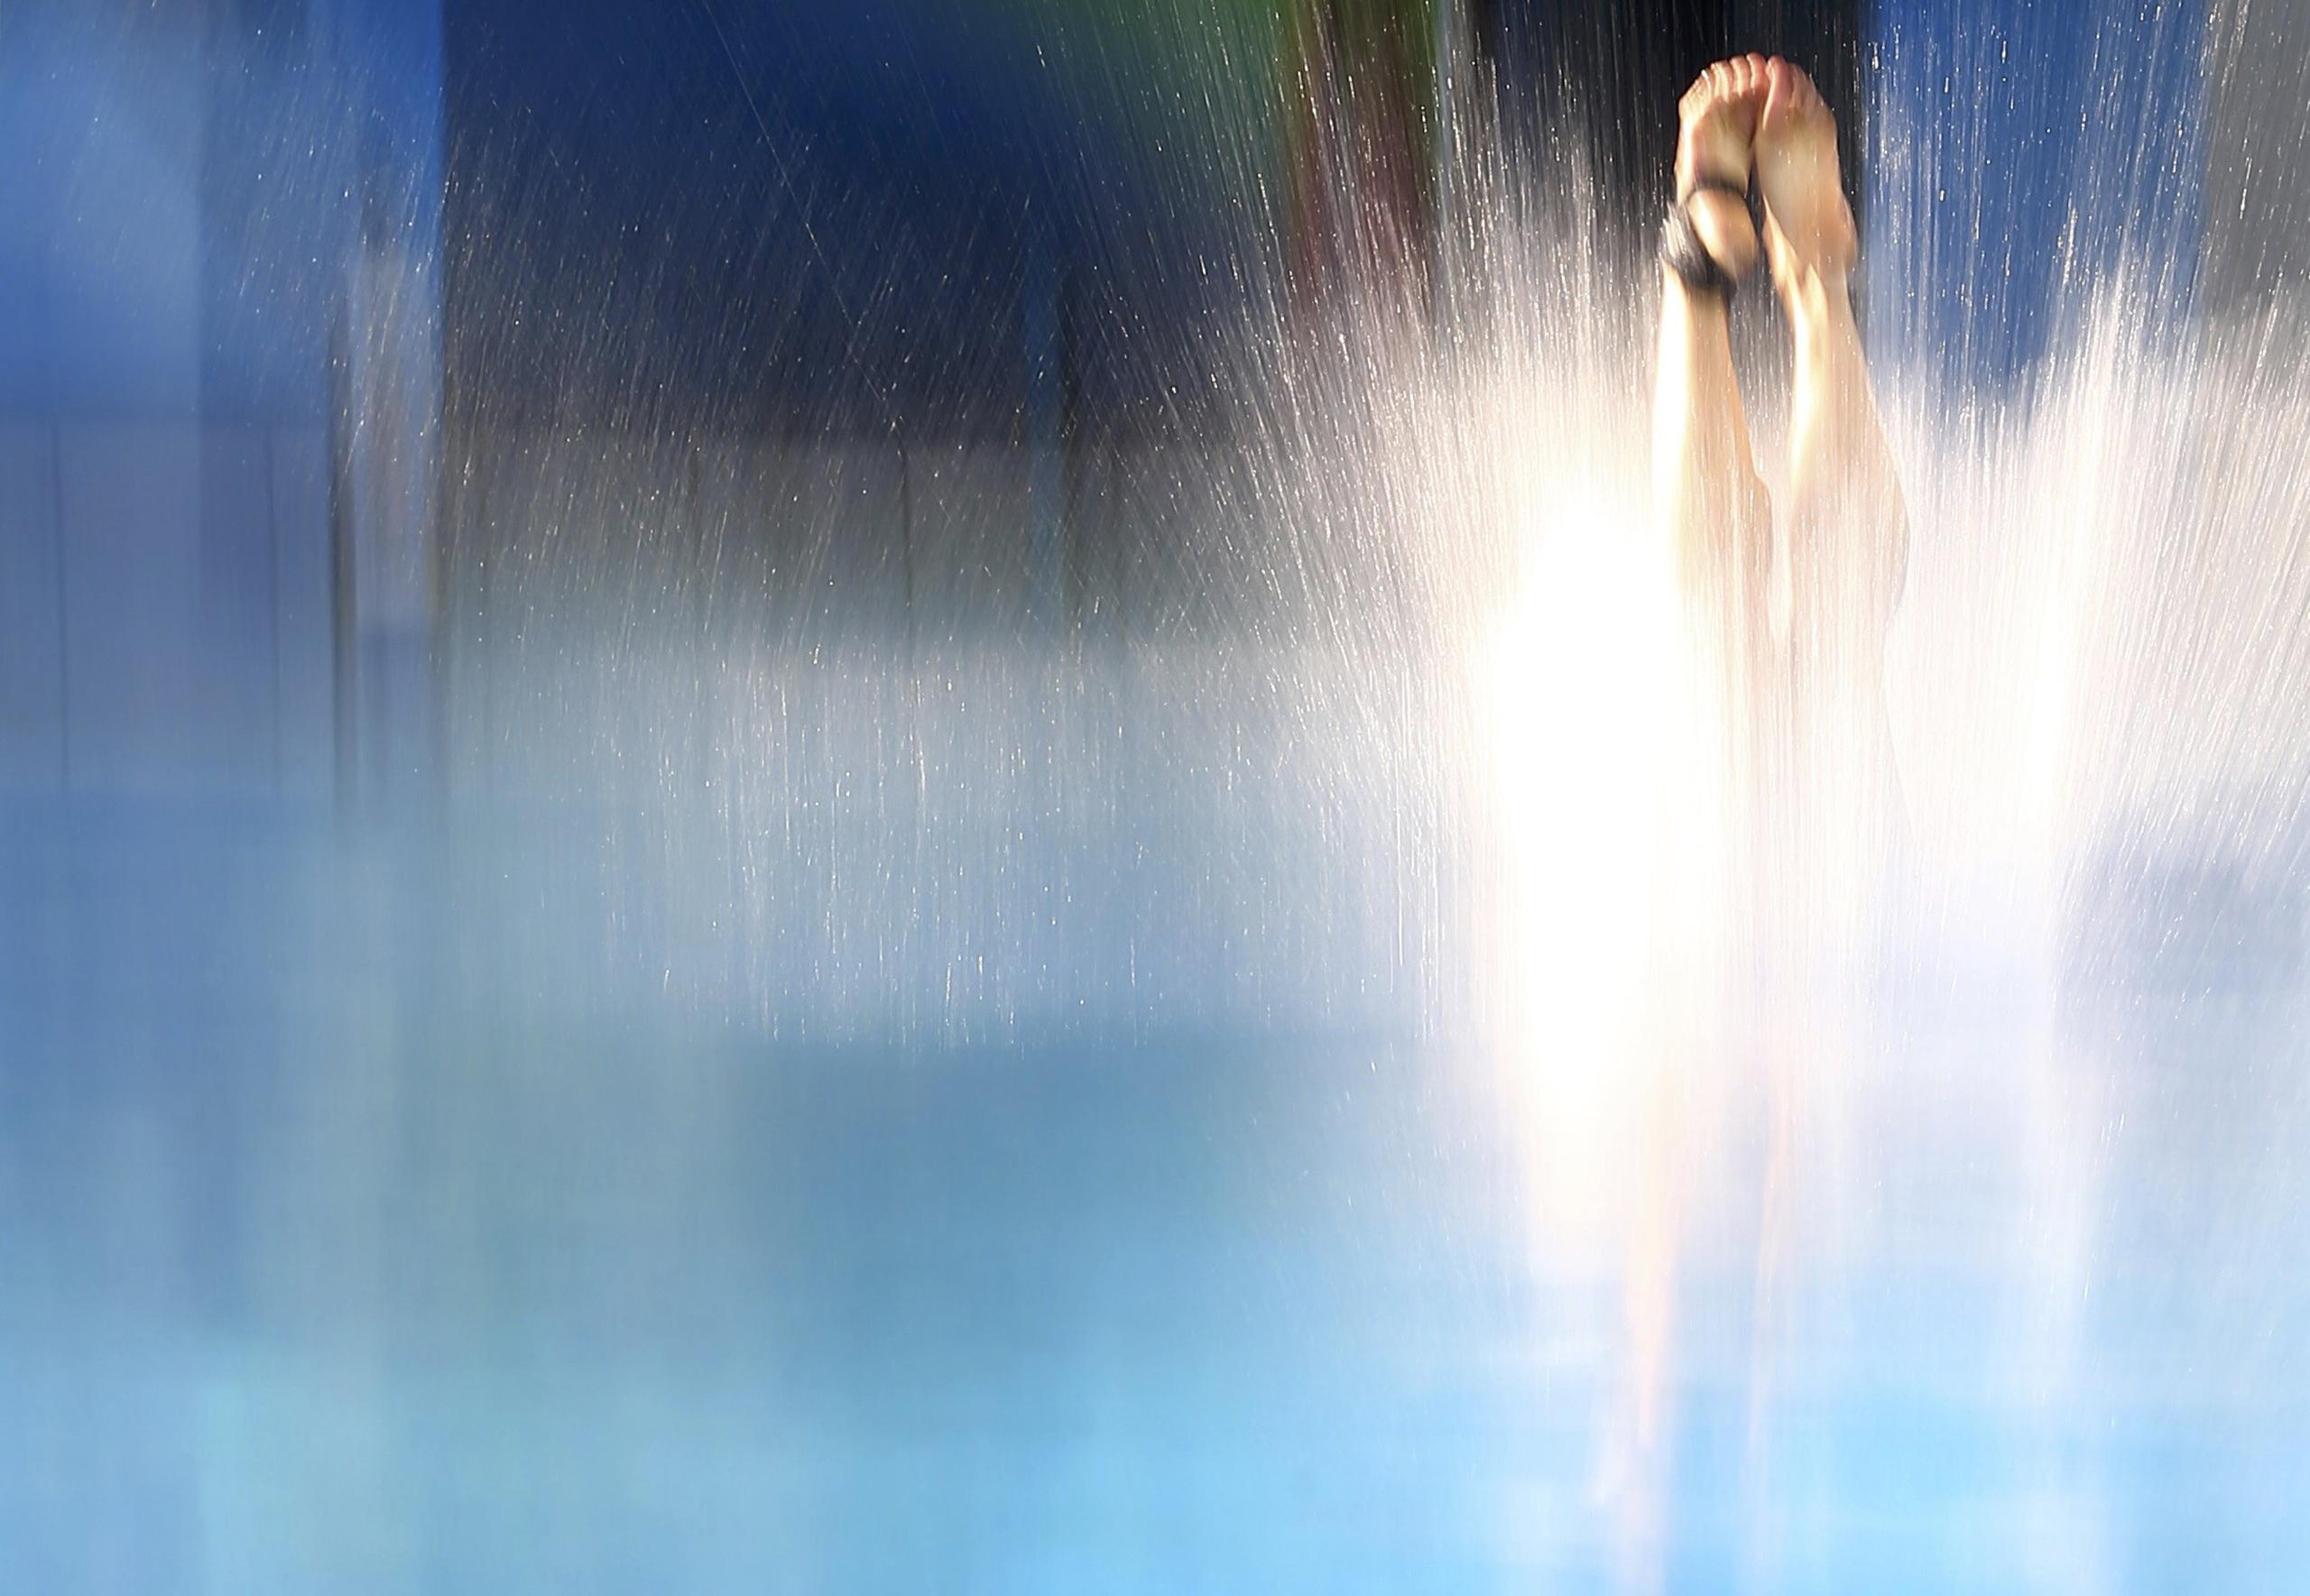 Pandelela Rinong Pamg of Malaysia competes in the Women's 10m Platform Preliminary at the Maria Lenk Aquatics Centre in Rio de Janeiro, Brazil, Aug. 17, 2016.